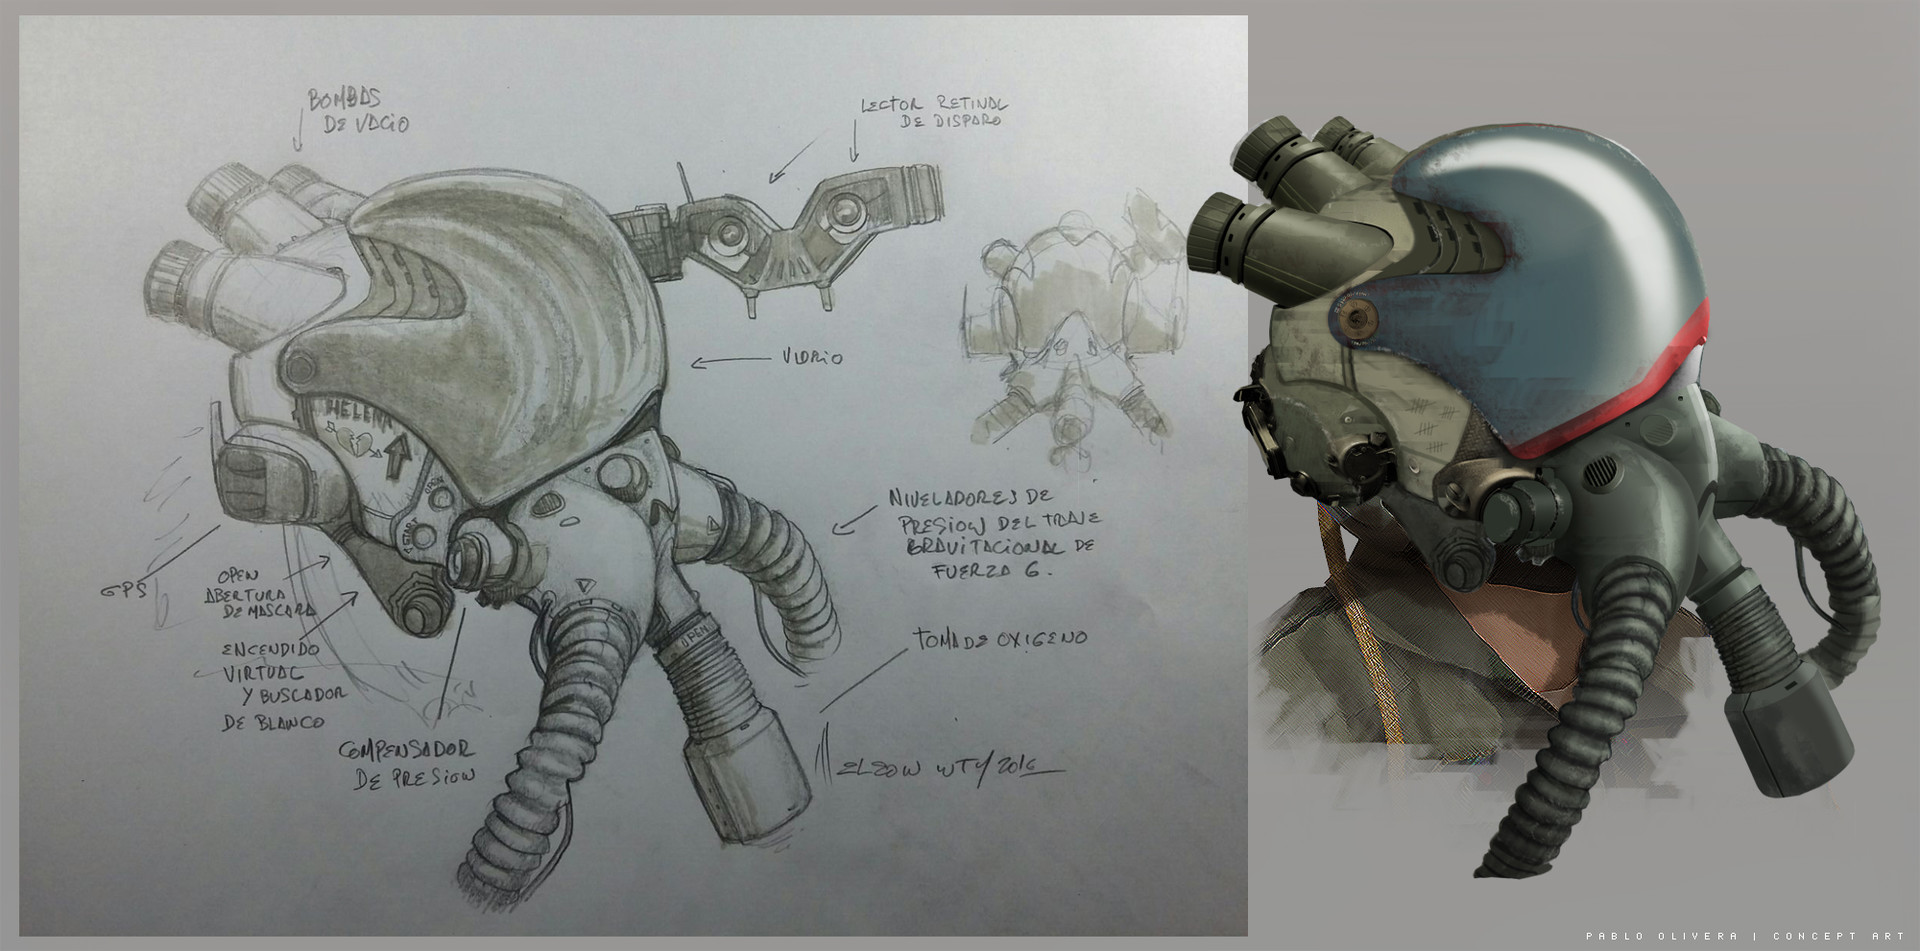 Pablo olivera sons of light helmet design v02